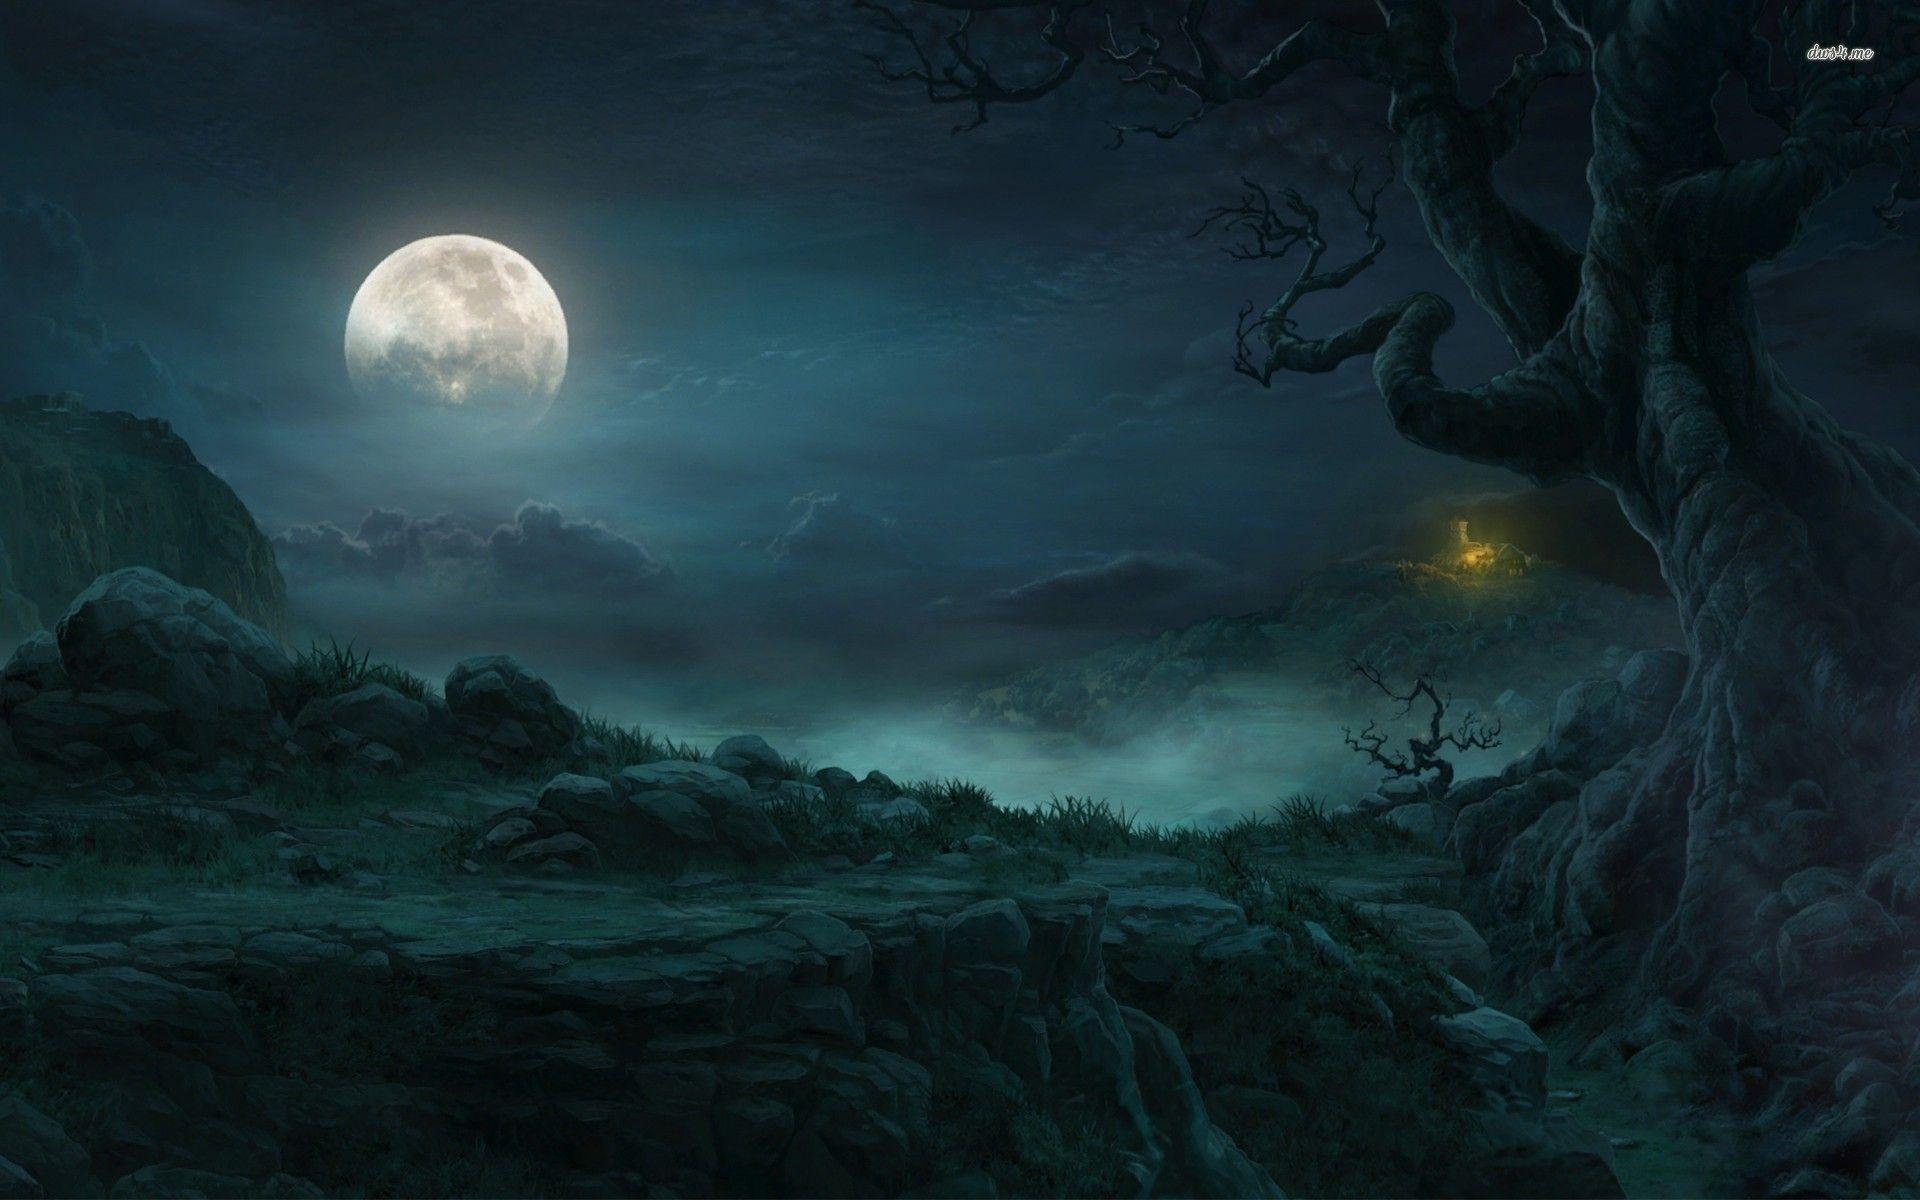 Dark Forest Moon Wallpaper Hd On Wallpaper 1080p Hd Fantasy Landscape Forest Moon Moon Artwork